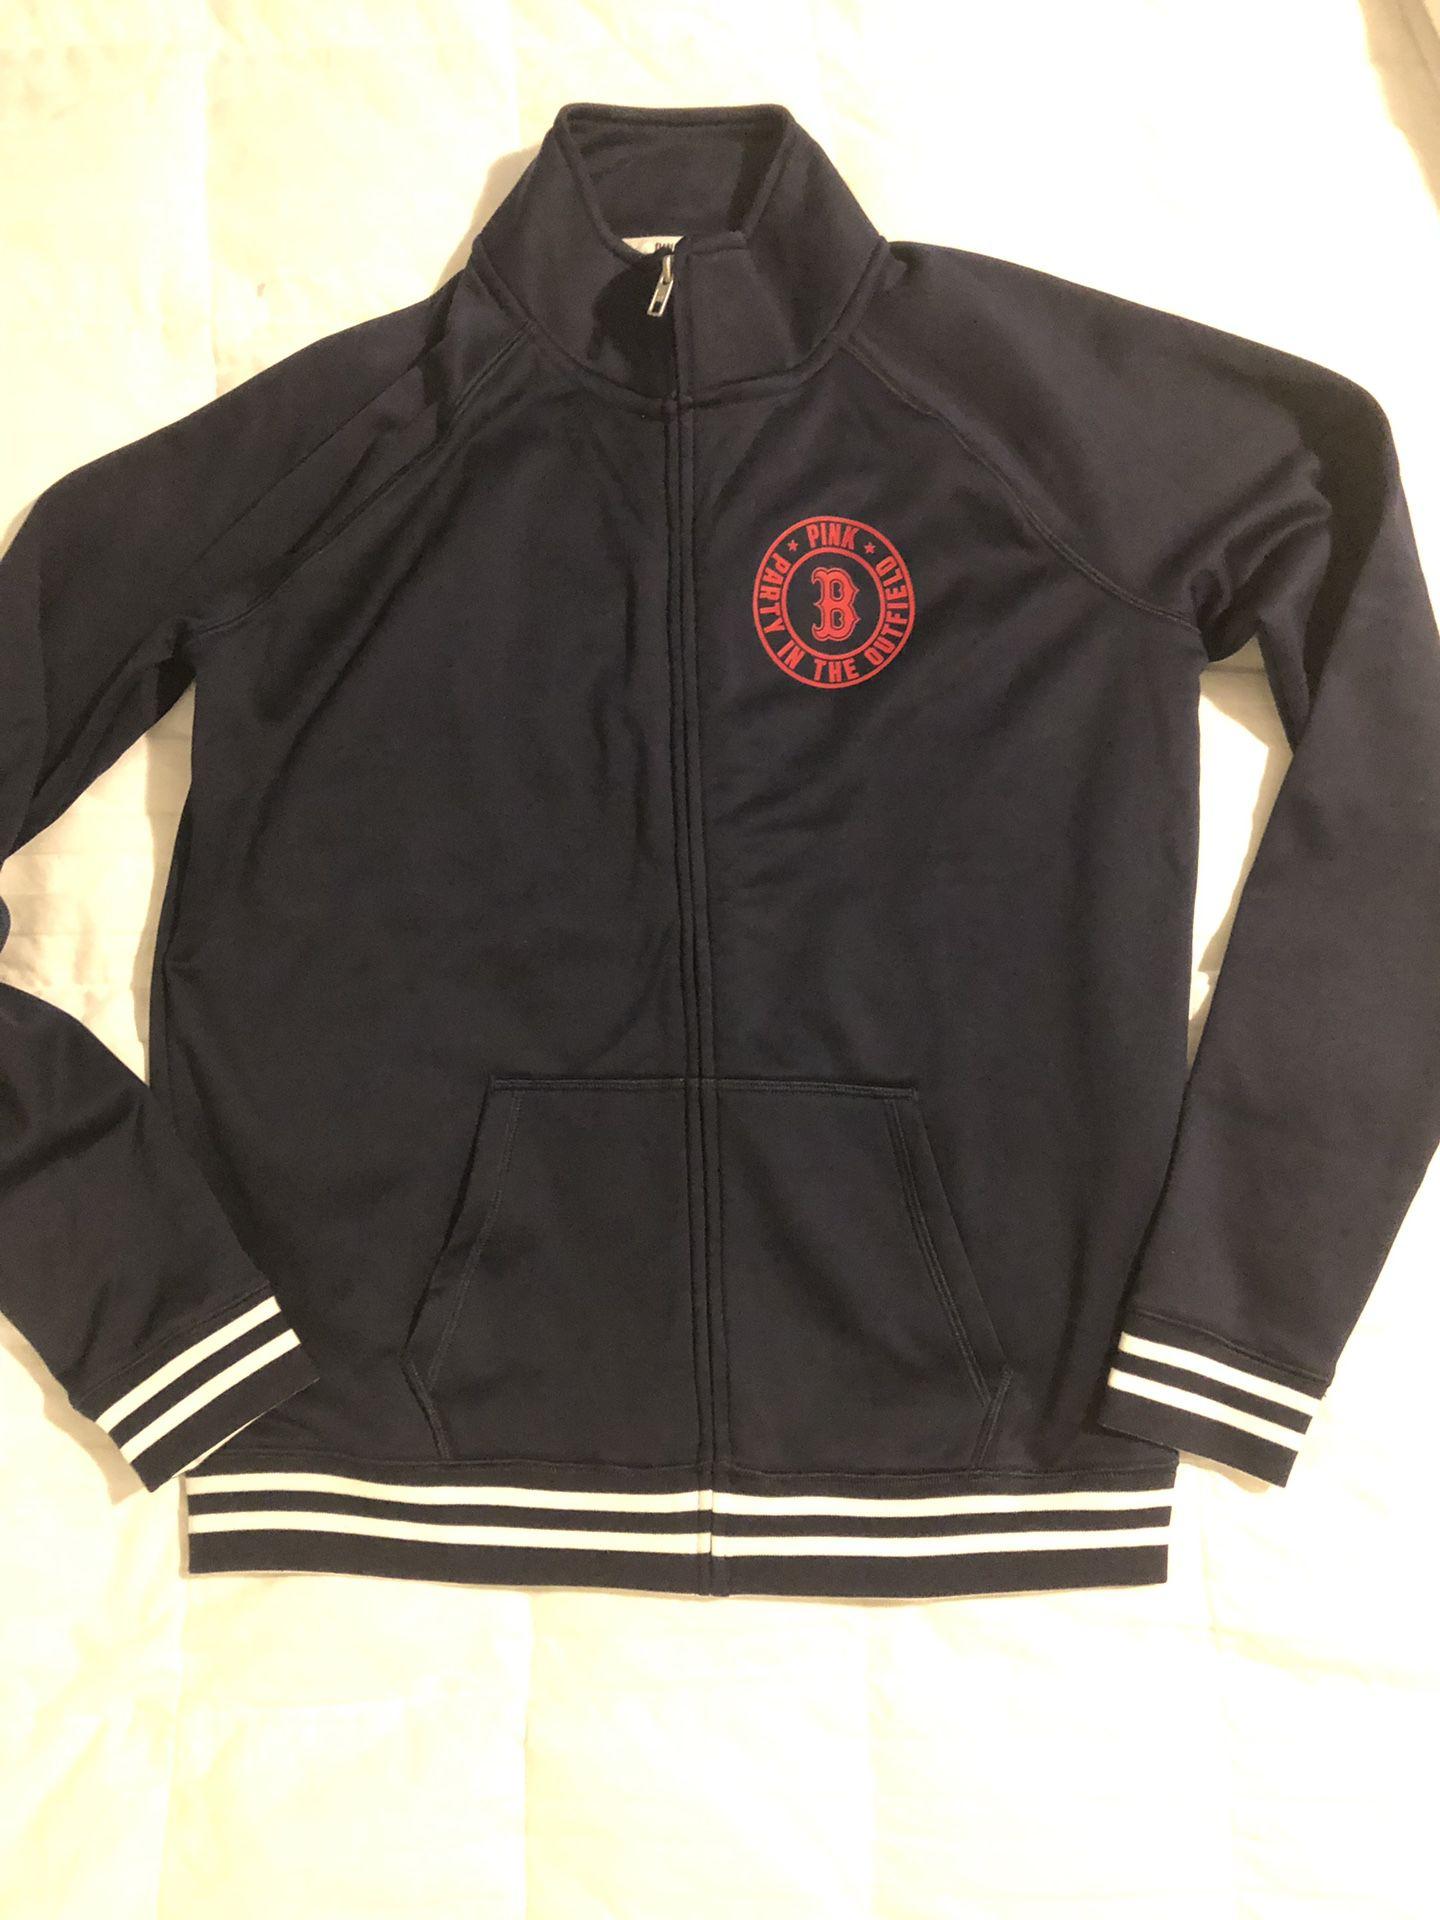 Victoria's Secret PINK Boston Red Sox Jacket